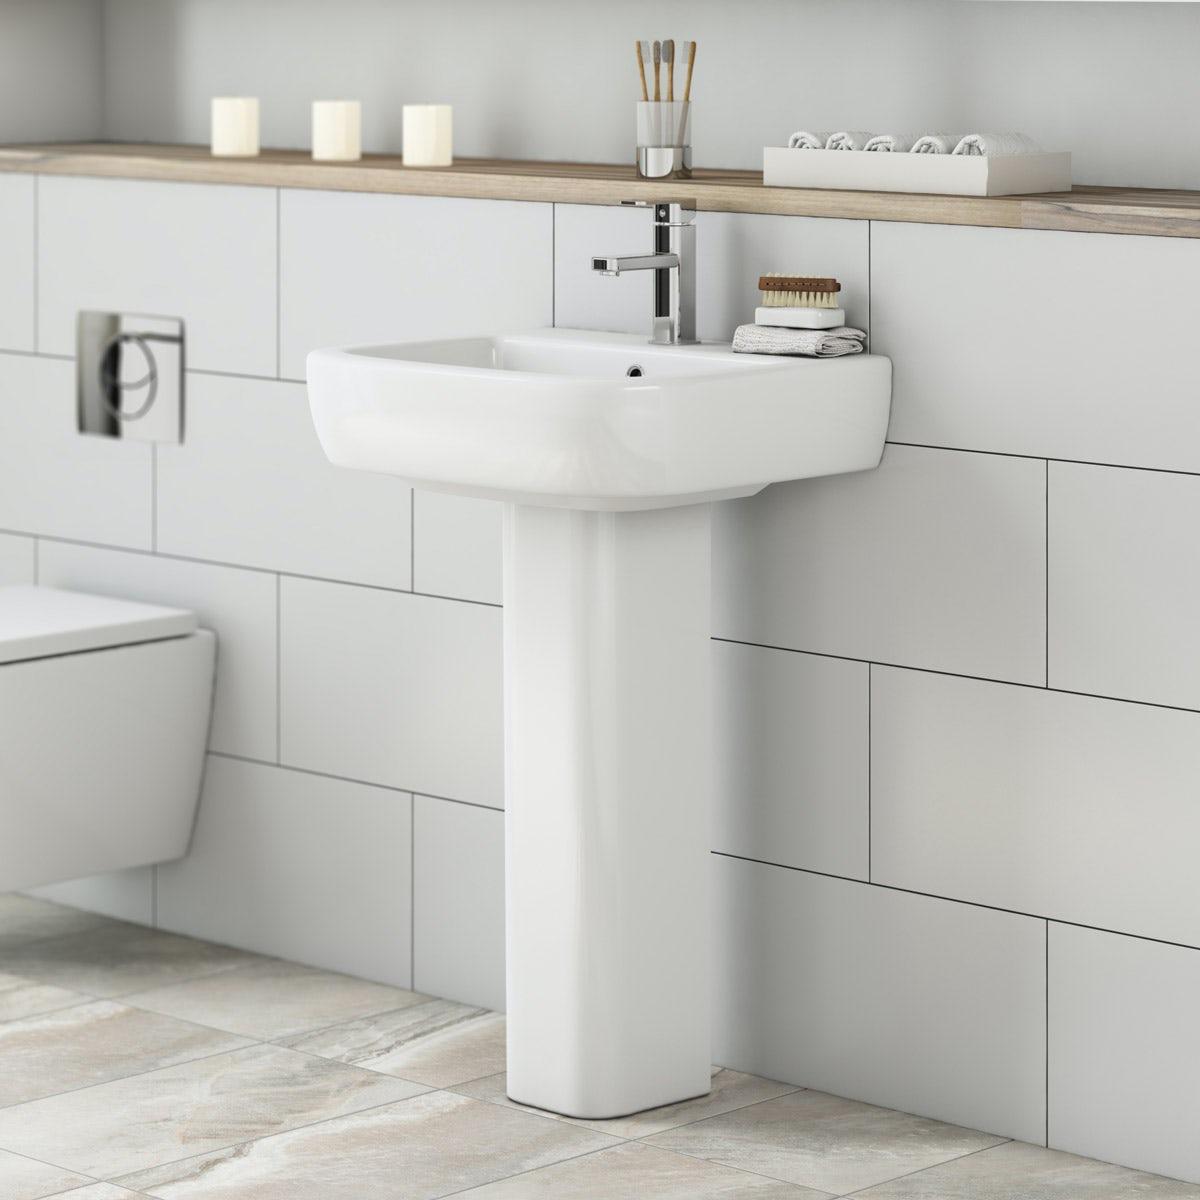 Mode Ellis full pedestal basin